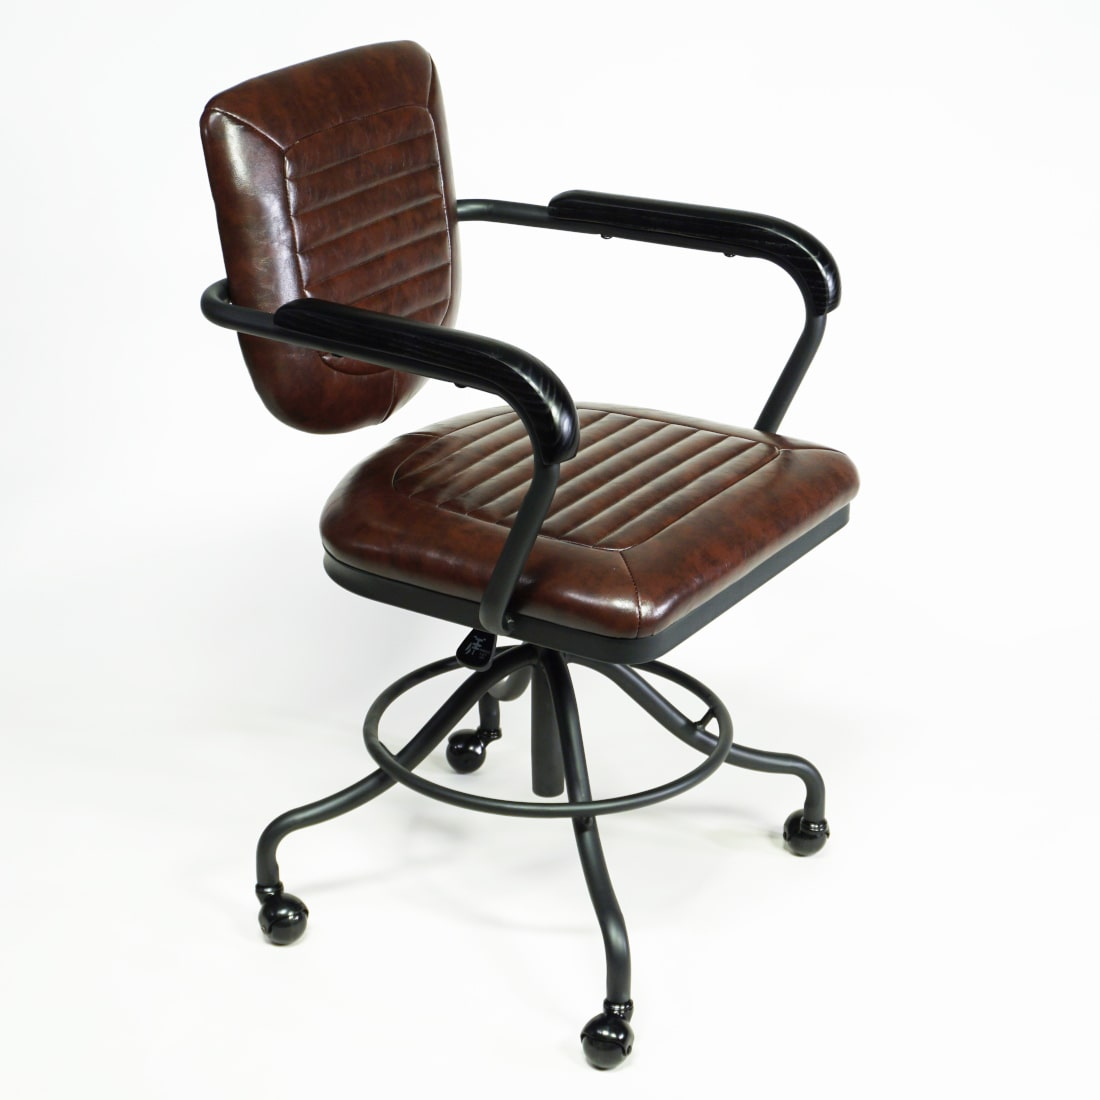 Bürostuhl vintage industrial für Homeoffice